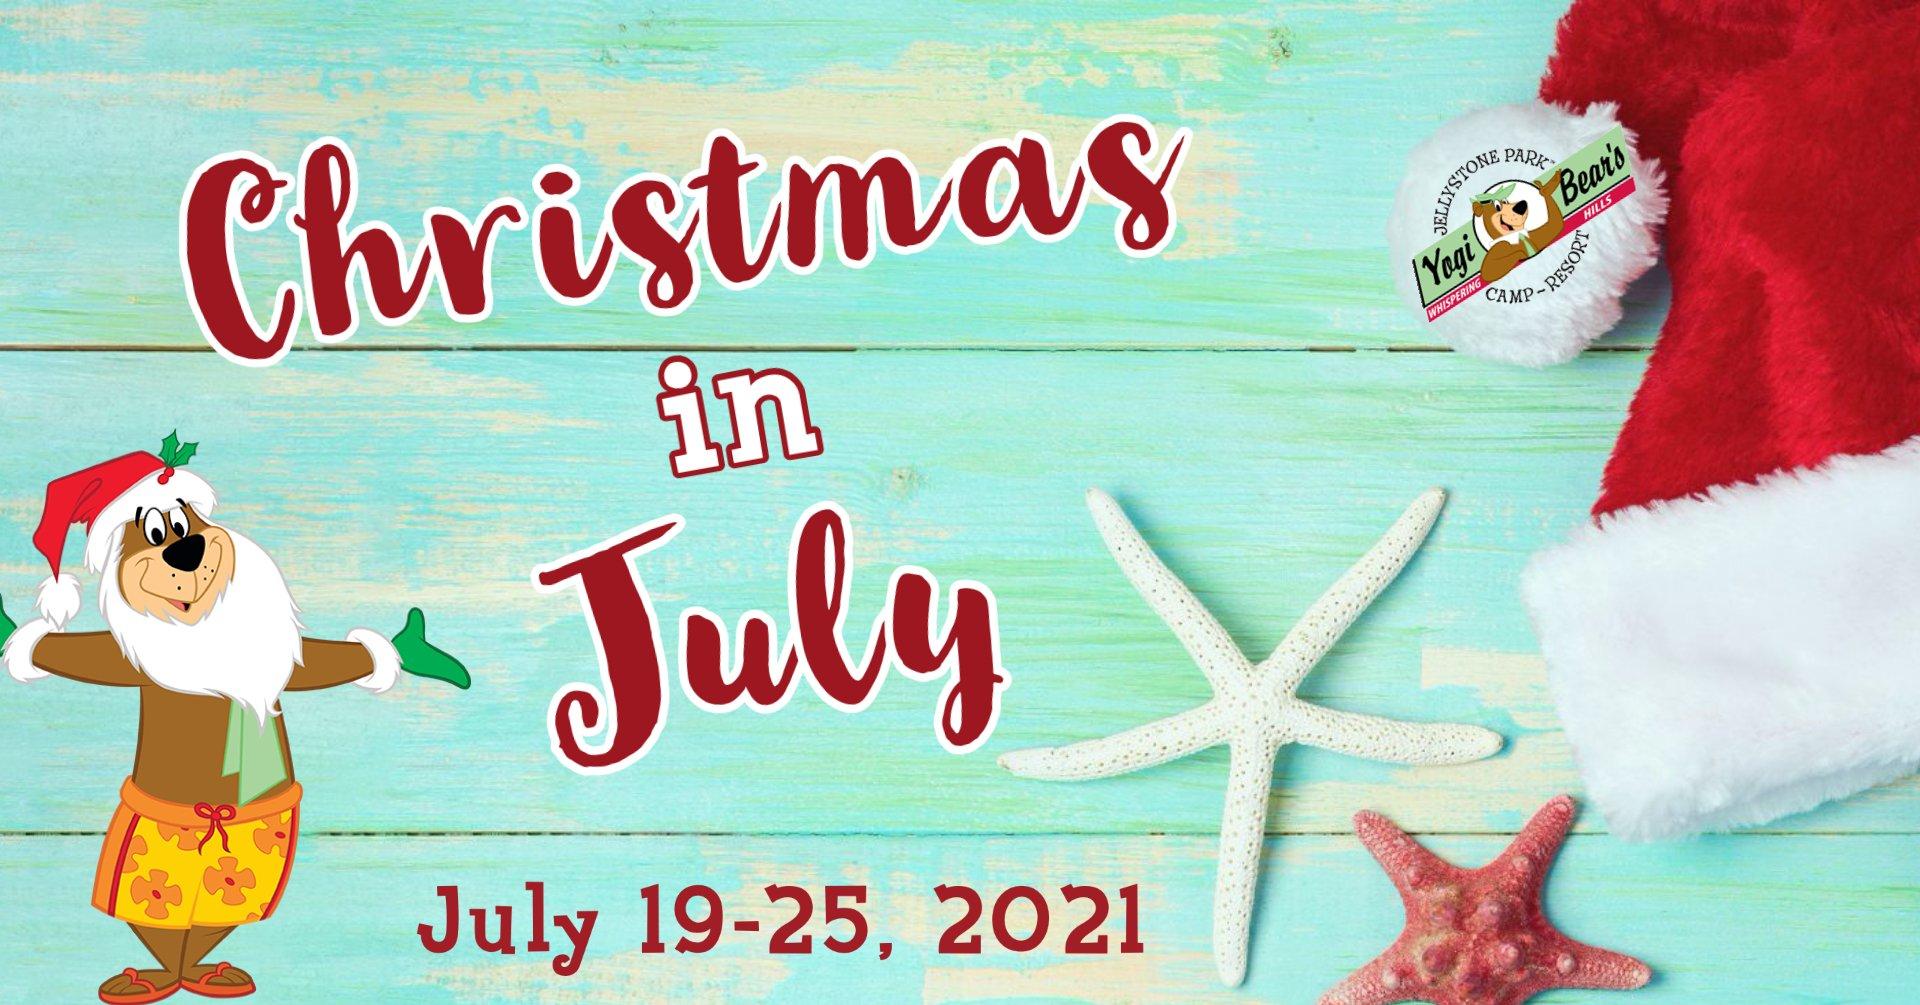 . Christmas In July 2021 Christmas In July Week Whispering Hills Jellystone Park